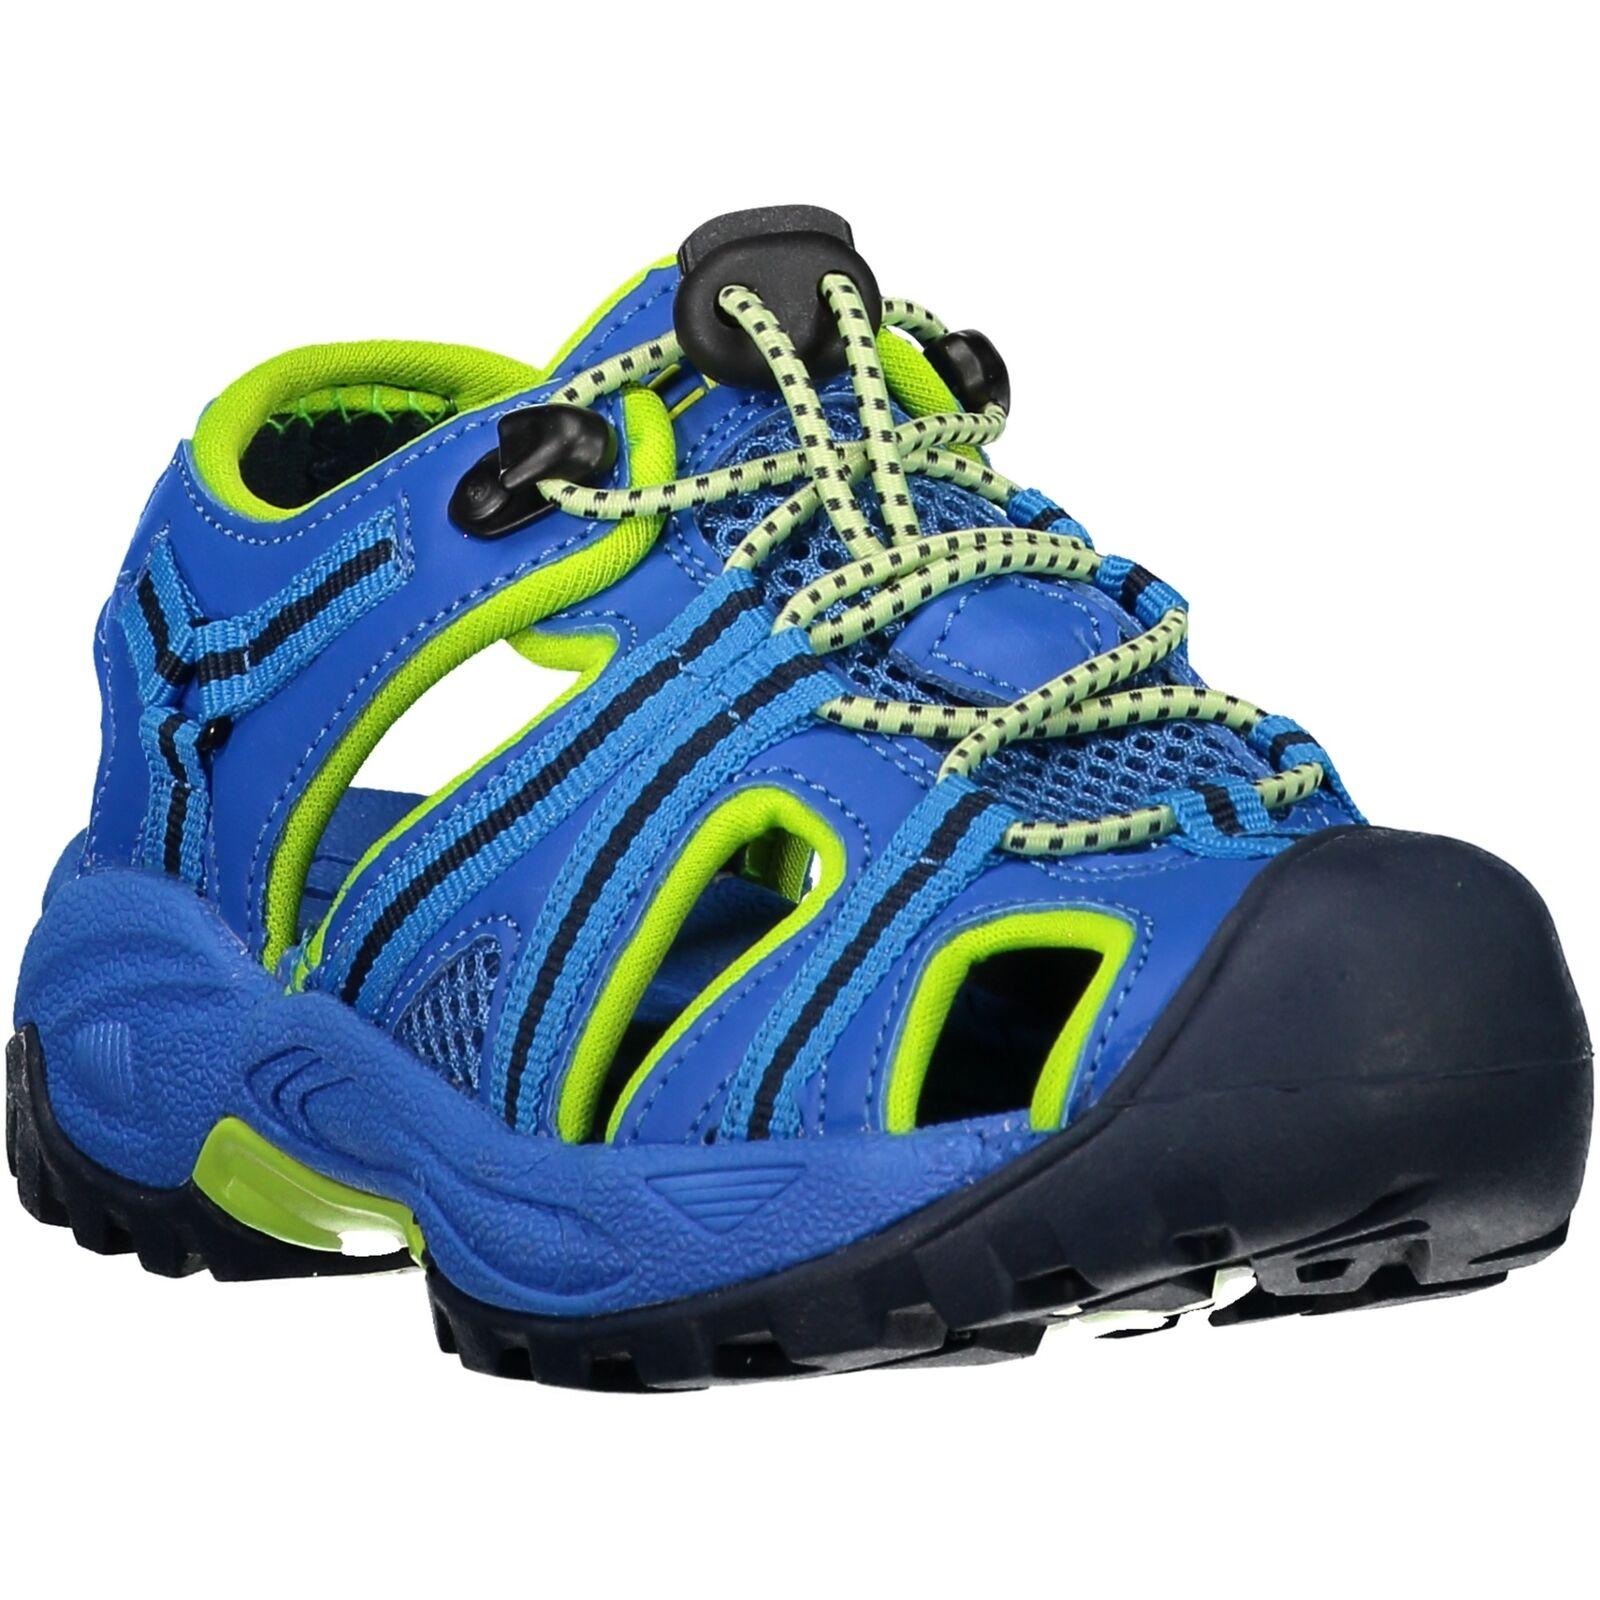 CMP  Walking Boots Kids Aquarii Hiking Sandal blue Plain Colour Textile  happy shopping